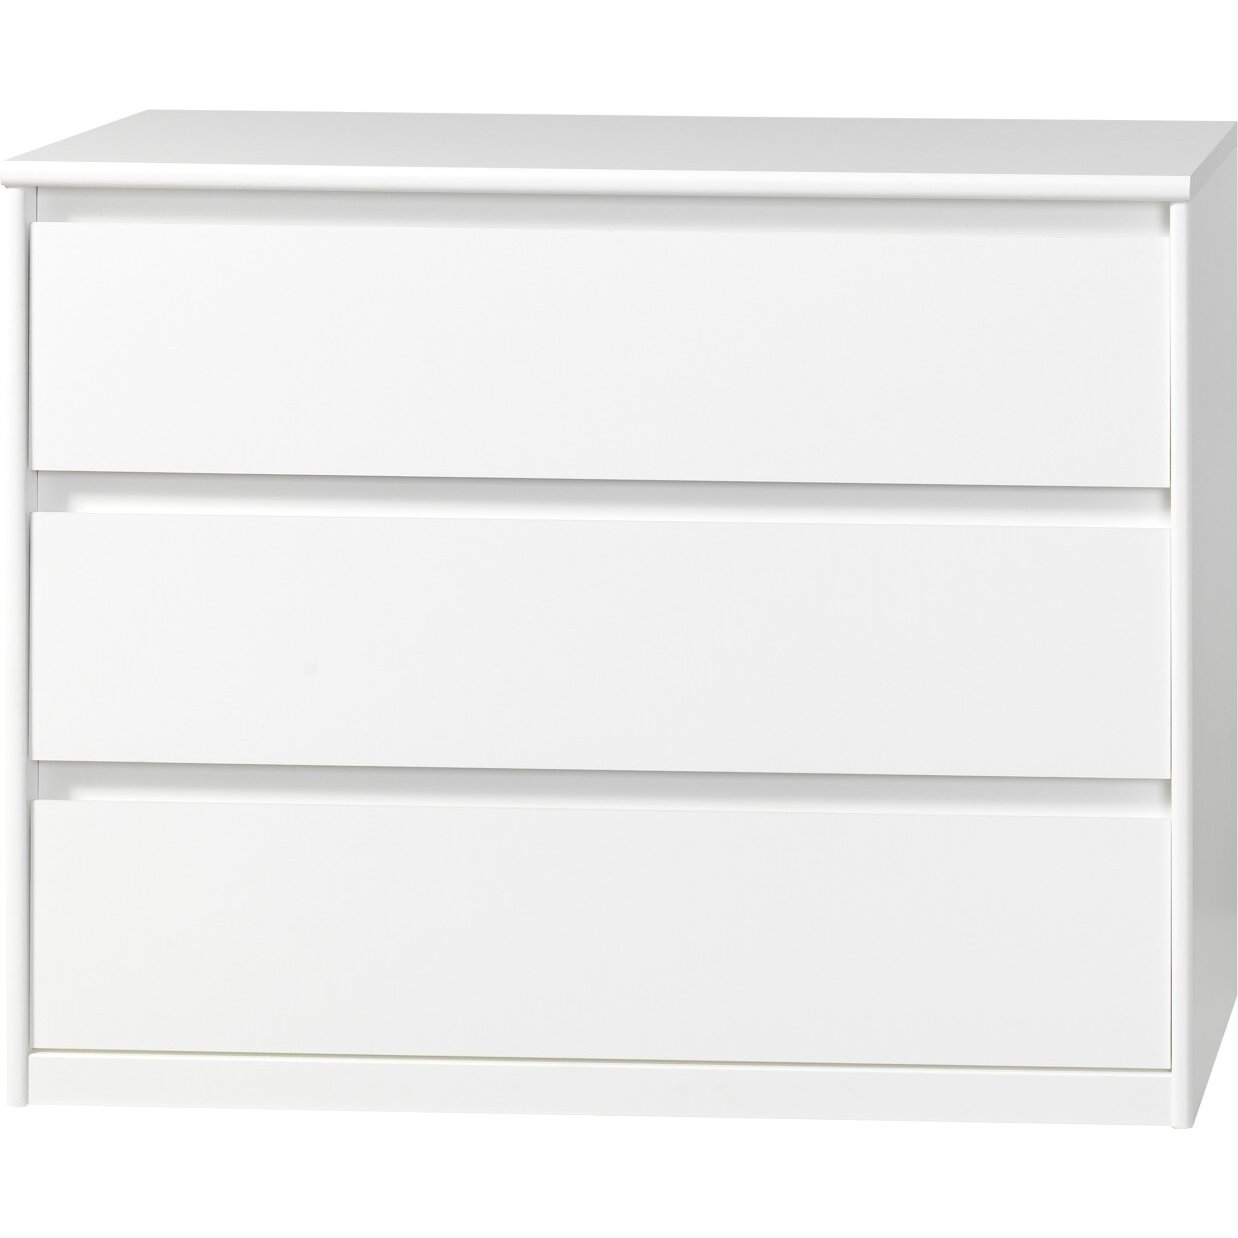 cs schmal soft smart 3 drawer chest of drawers reviews wayfair uk. Black Bedroom Furniture Sets. Home Design Ideas